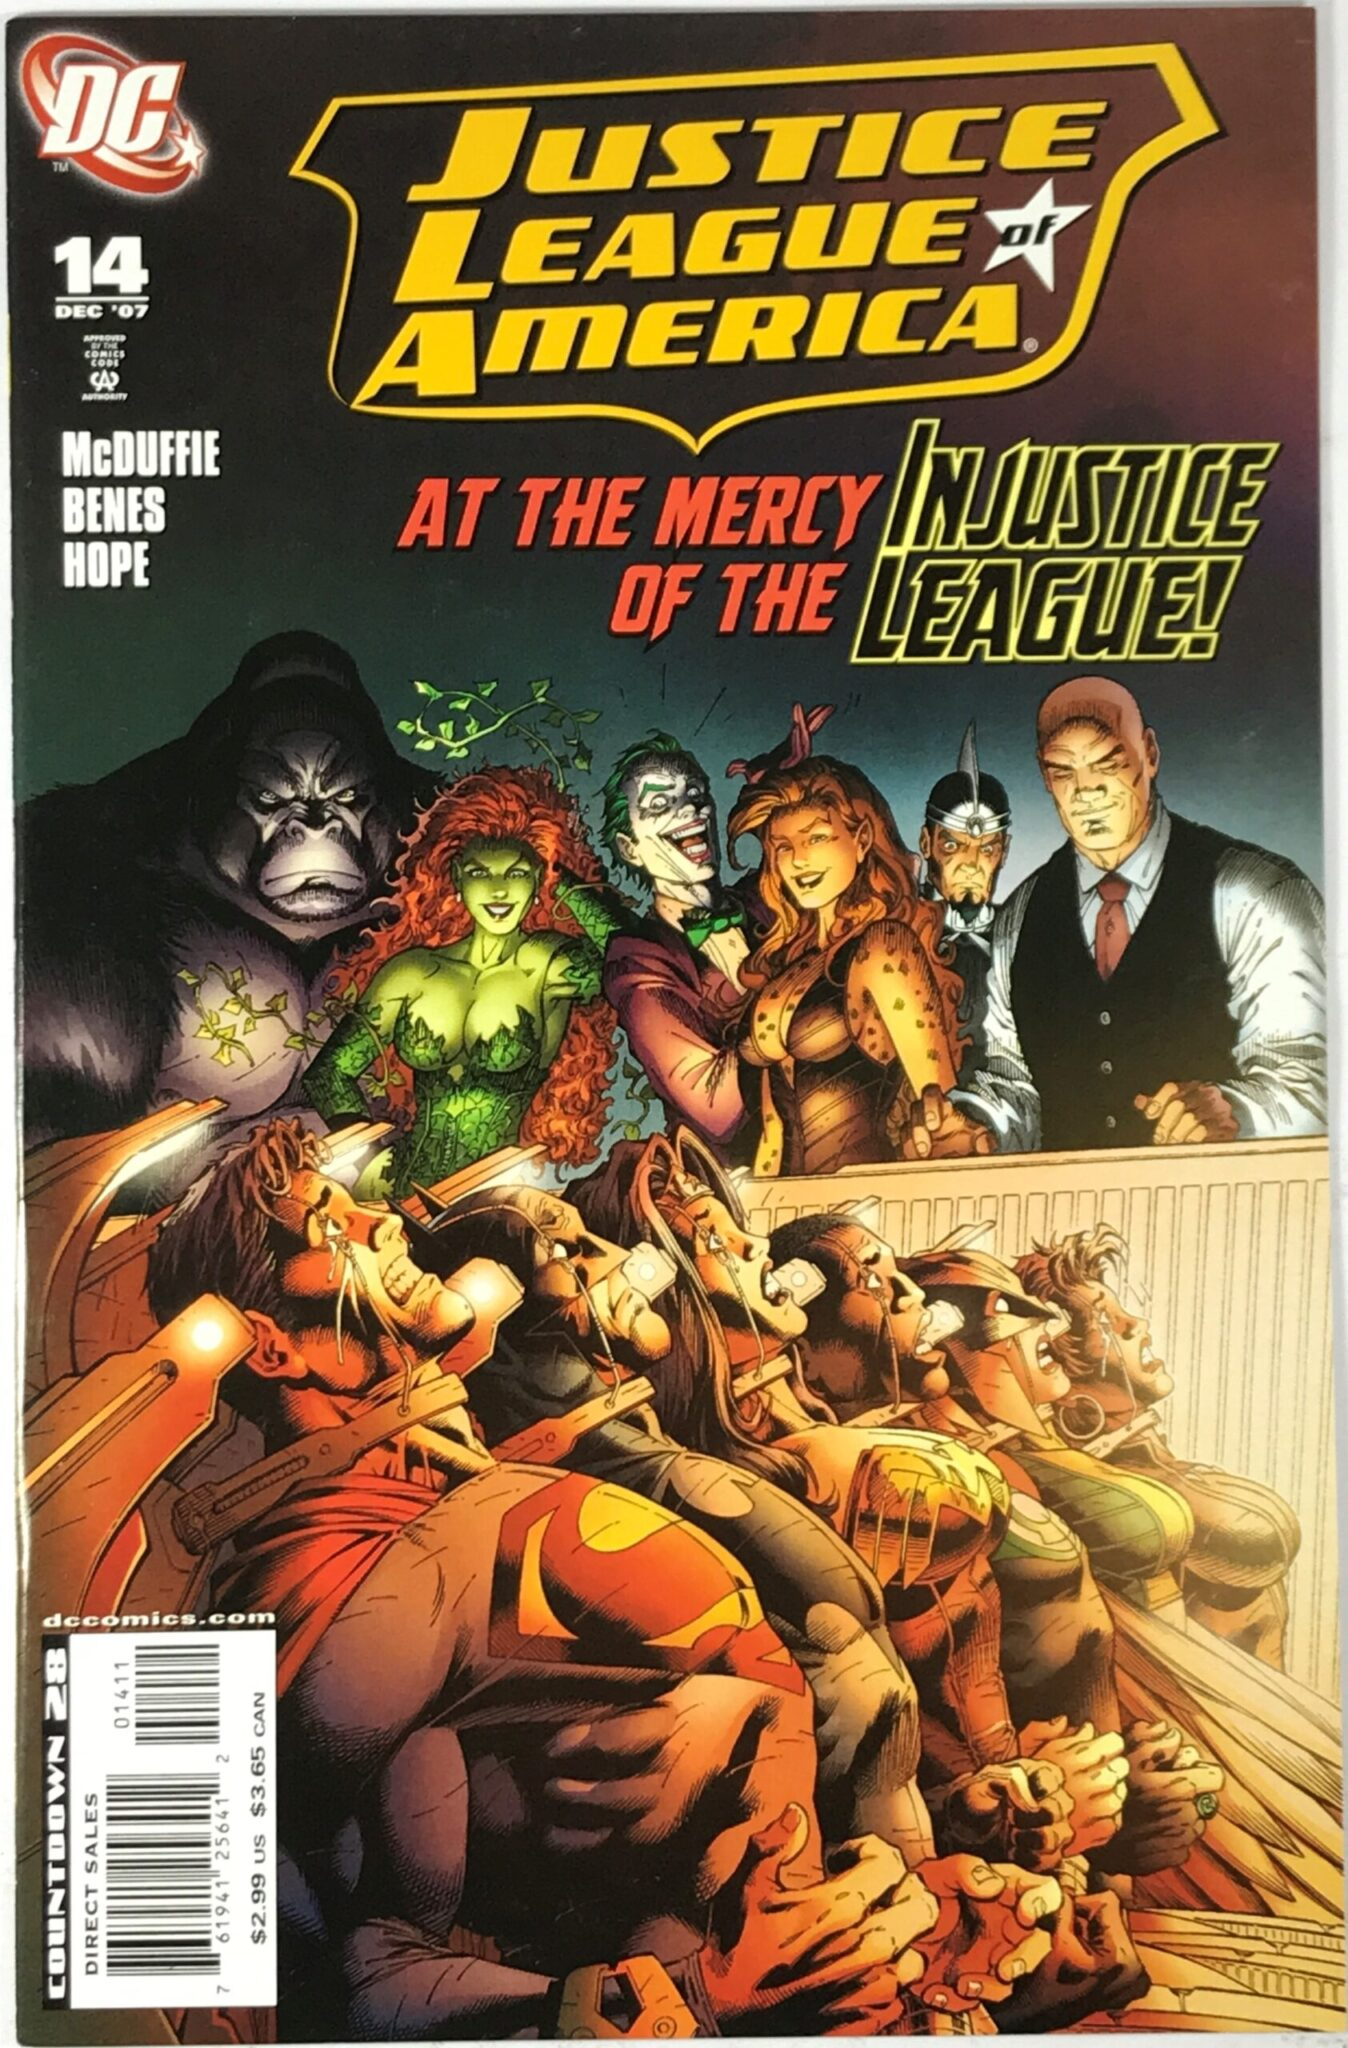 Justice League of America Vol. 2 (2006-2011) #14 - Very Fine 1